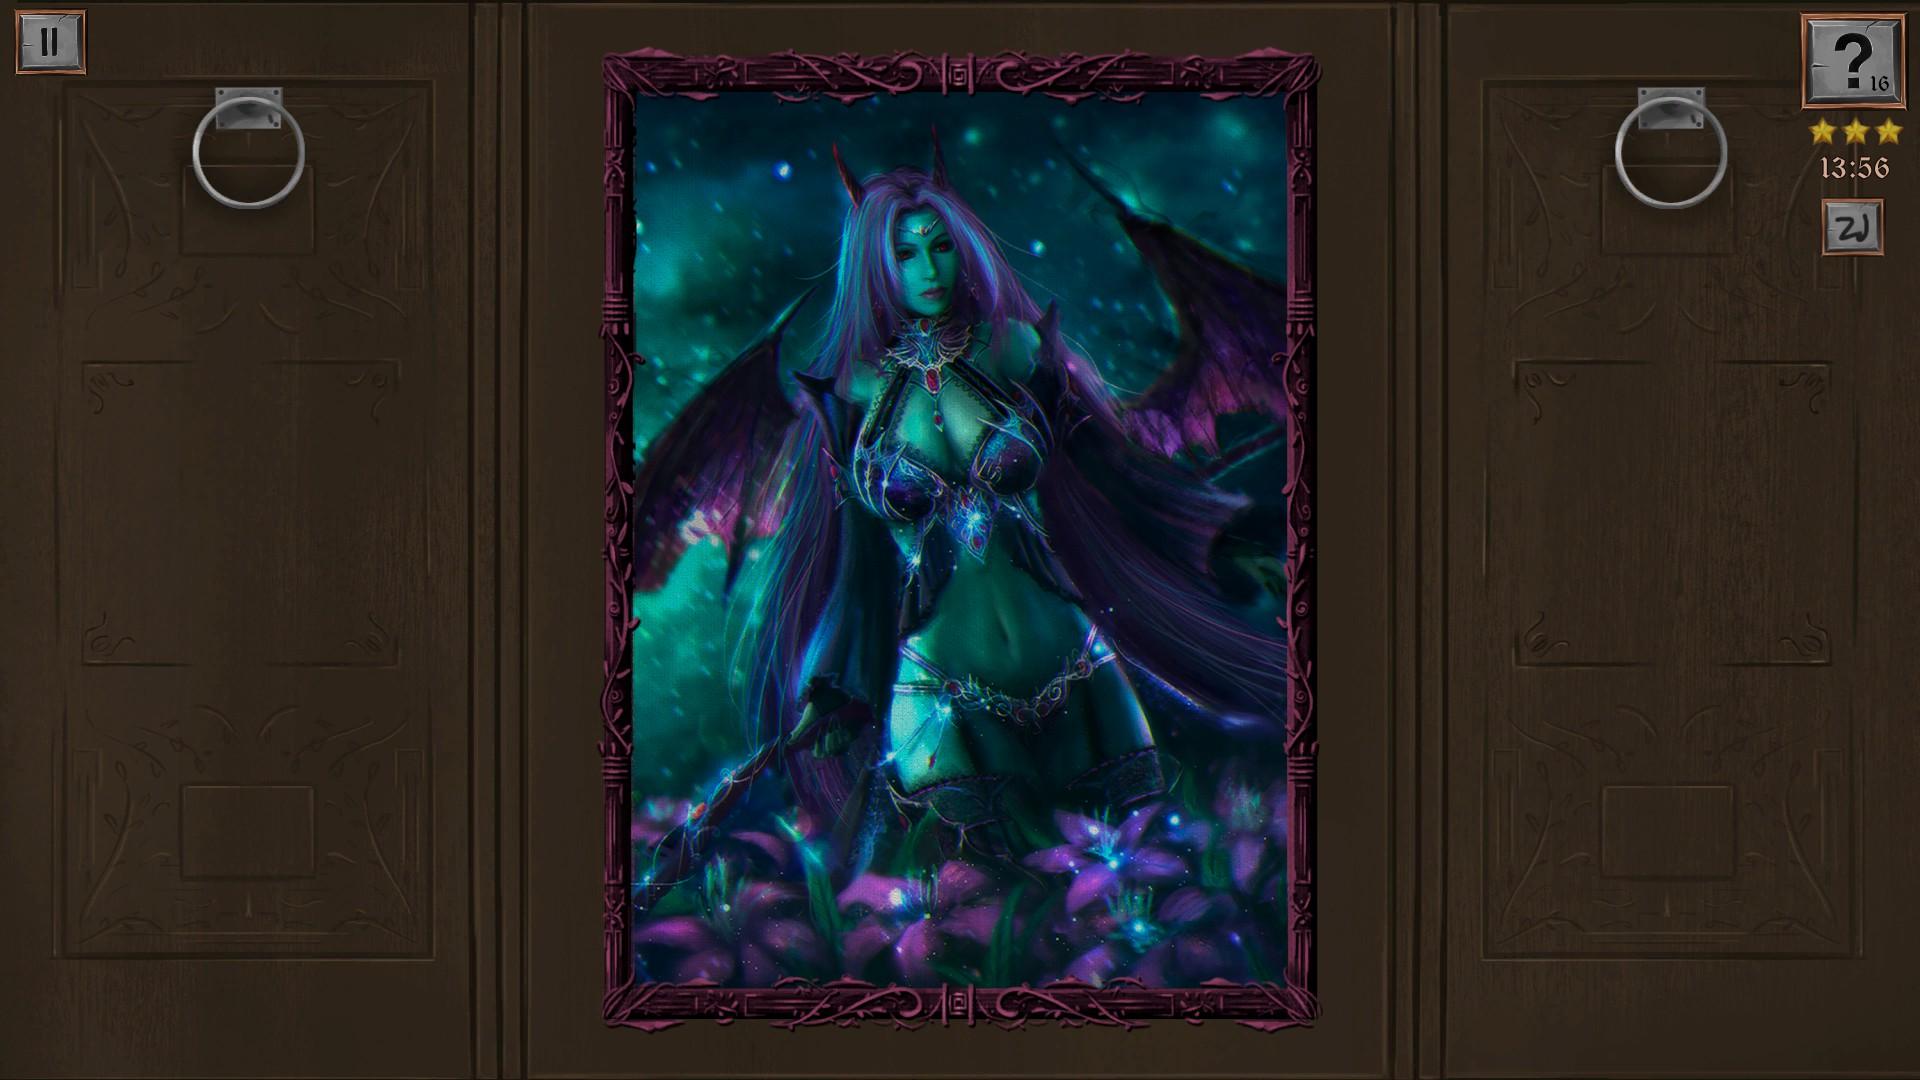 Dark Fantasy: Jigsaw Puzzle